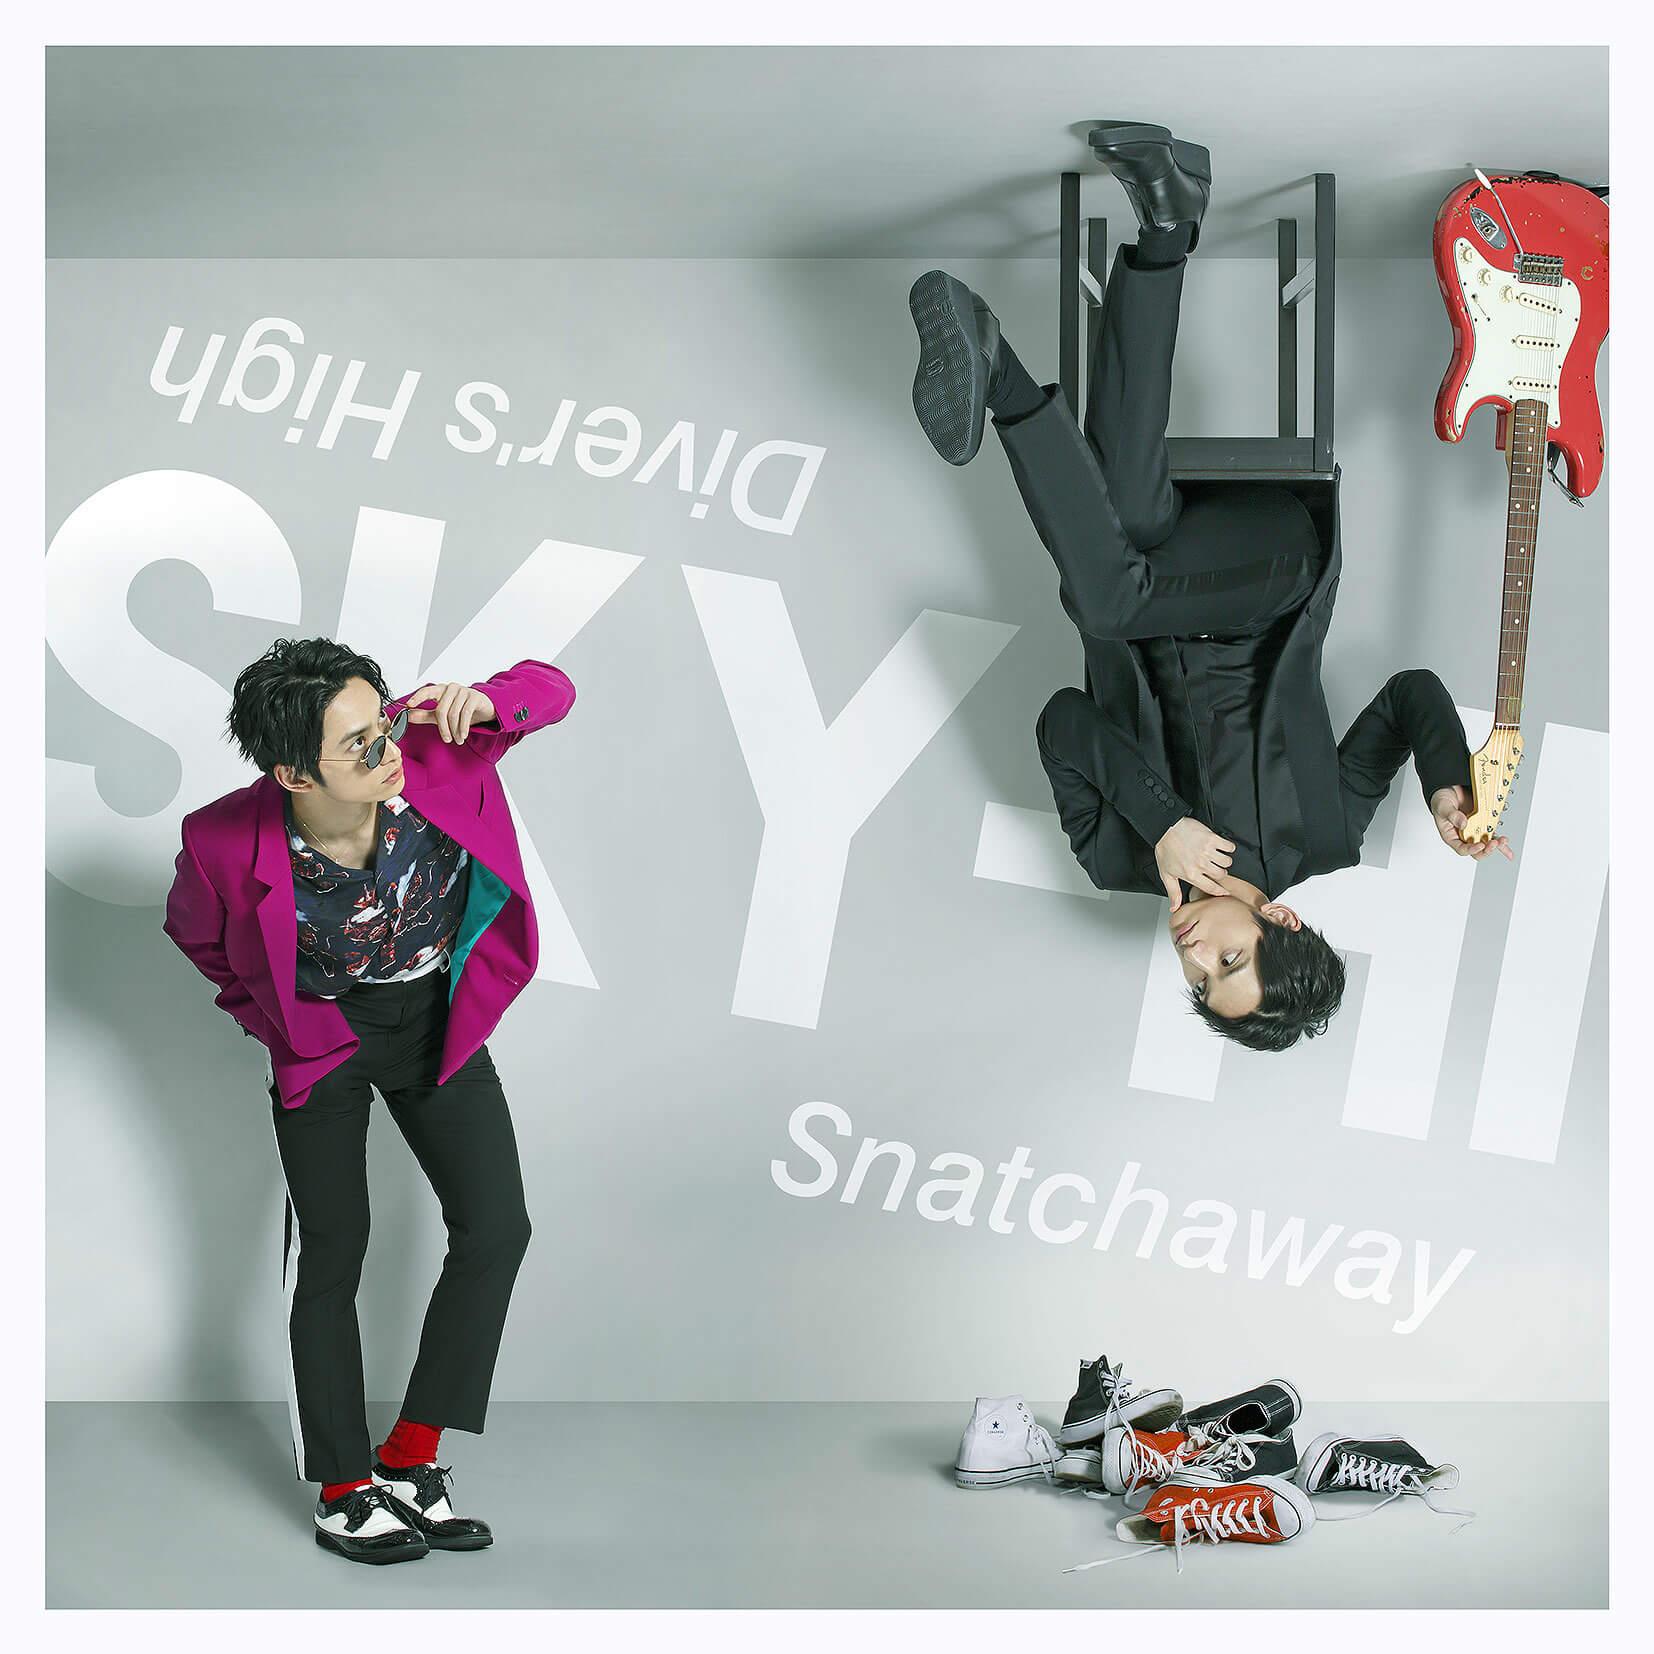 New Gundam Breaker Theme Song 'Snatchaway' by SKY-HI Teaser Released